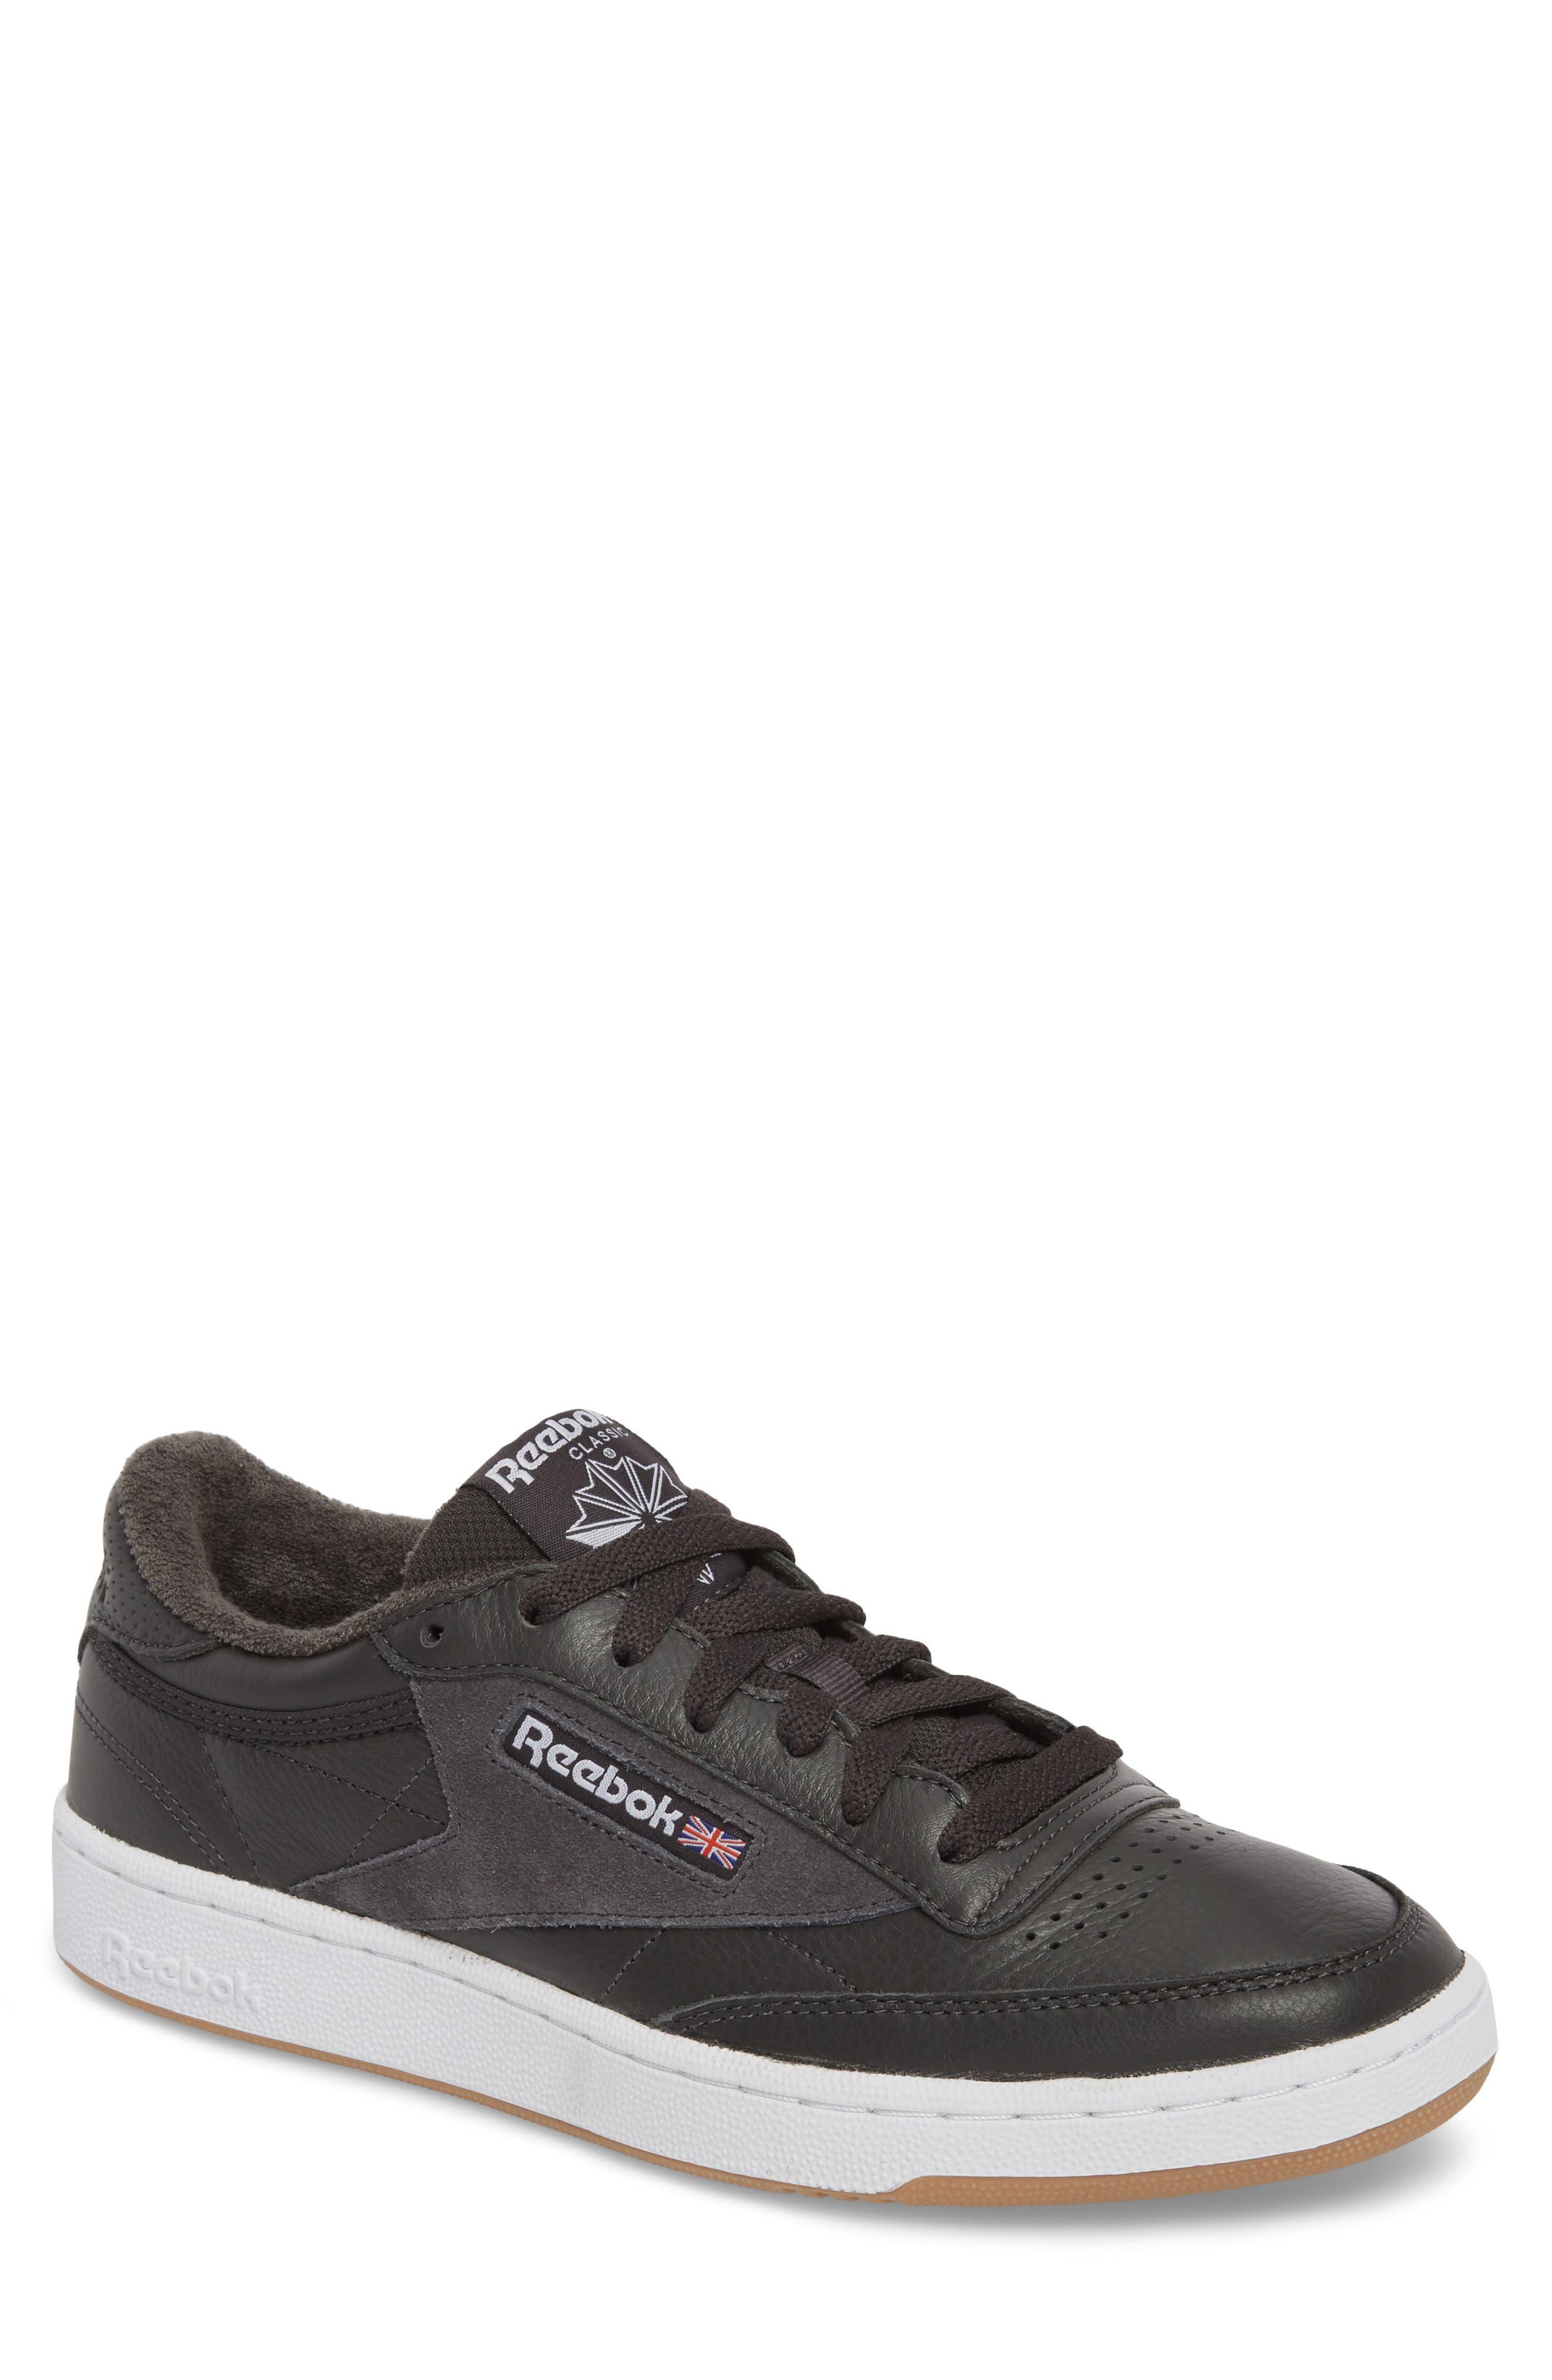 Club C 85 ESTL Sneaker,                             Main thumbnail 1, color,                             001